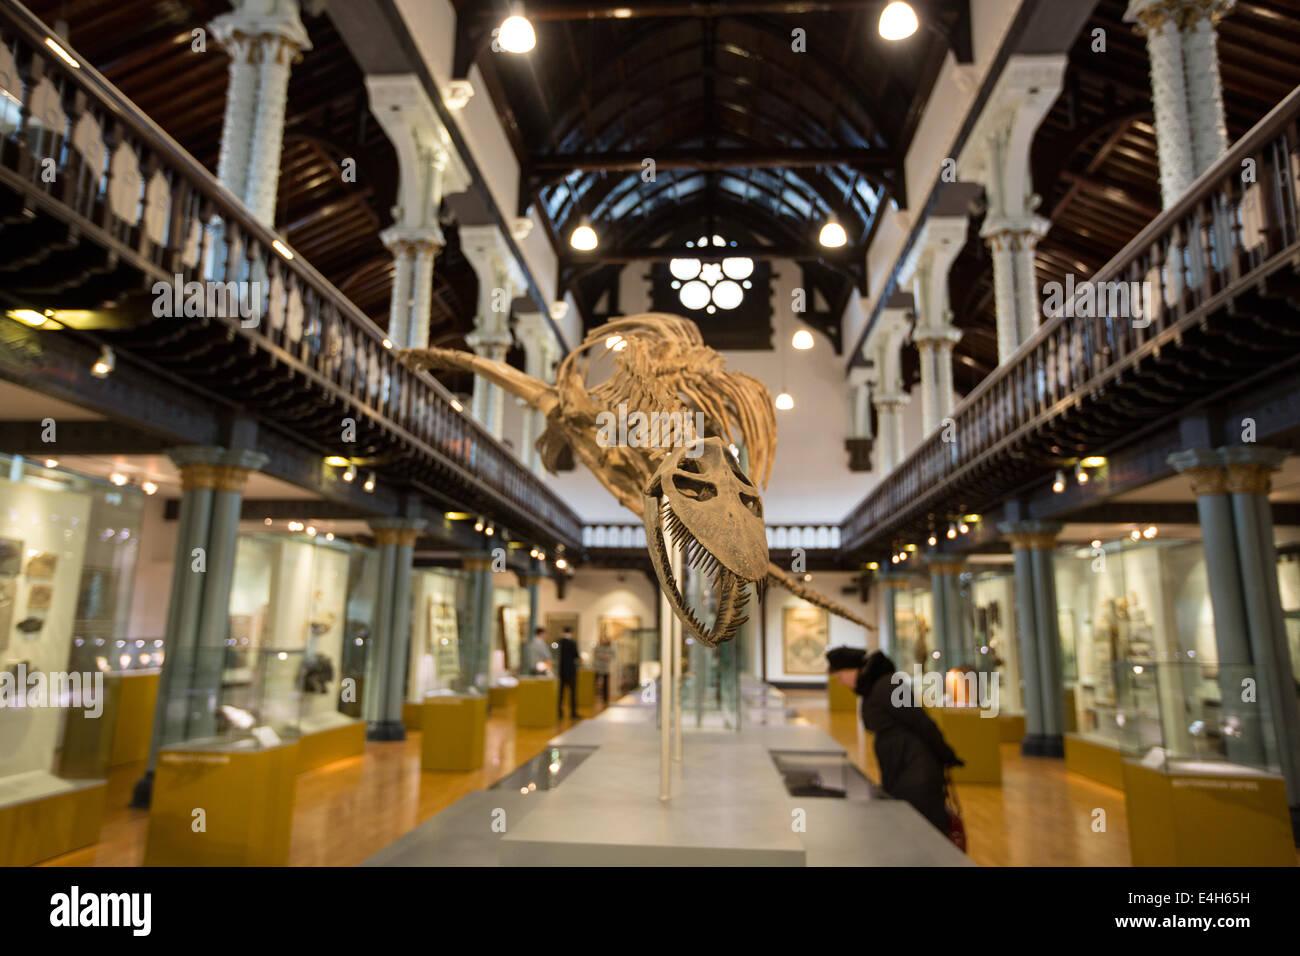 Hunterian Museum, University of Glasgow, Glasgow, Scotland. - Stock Image